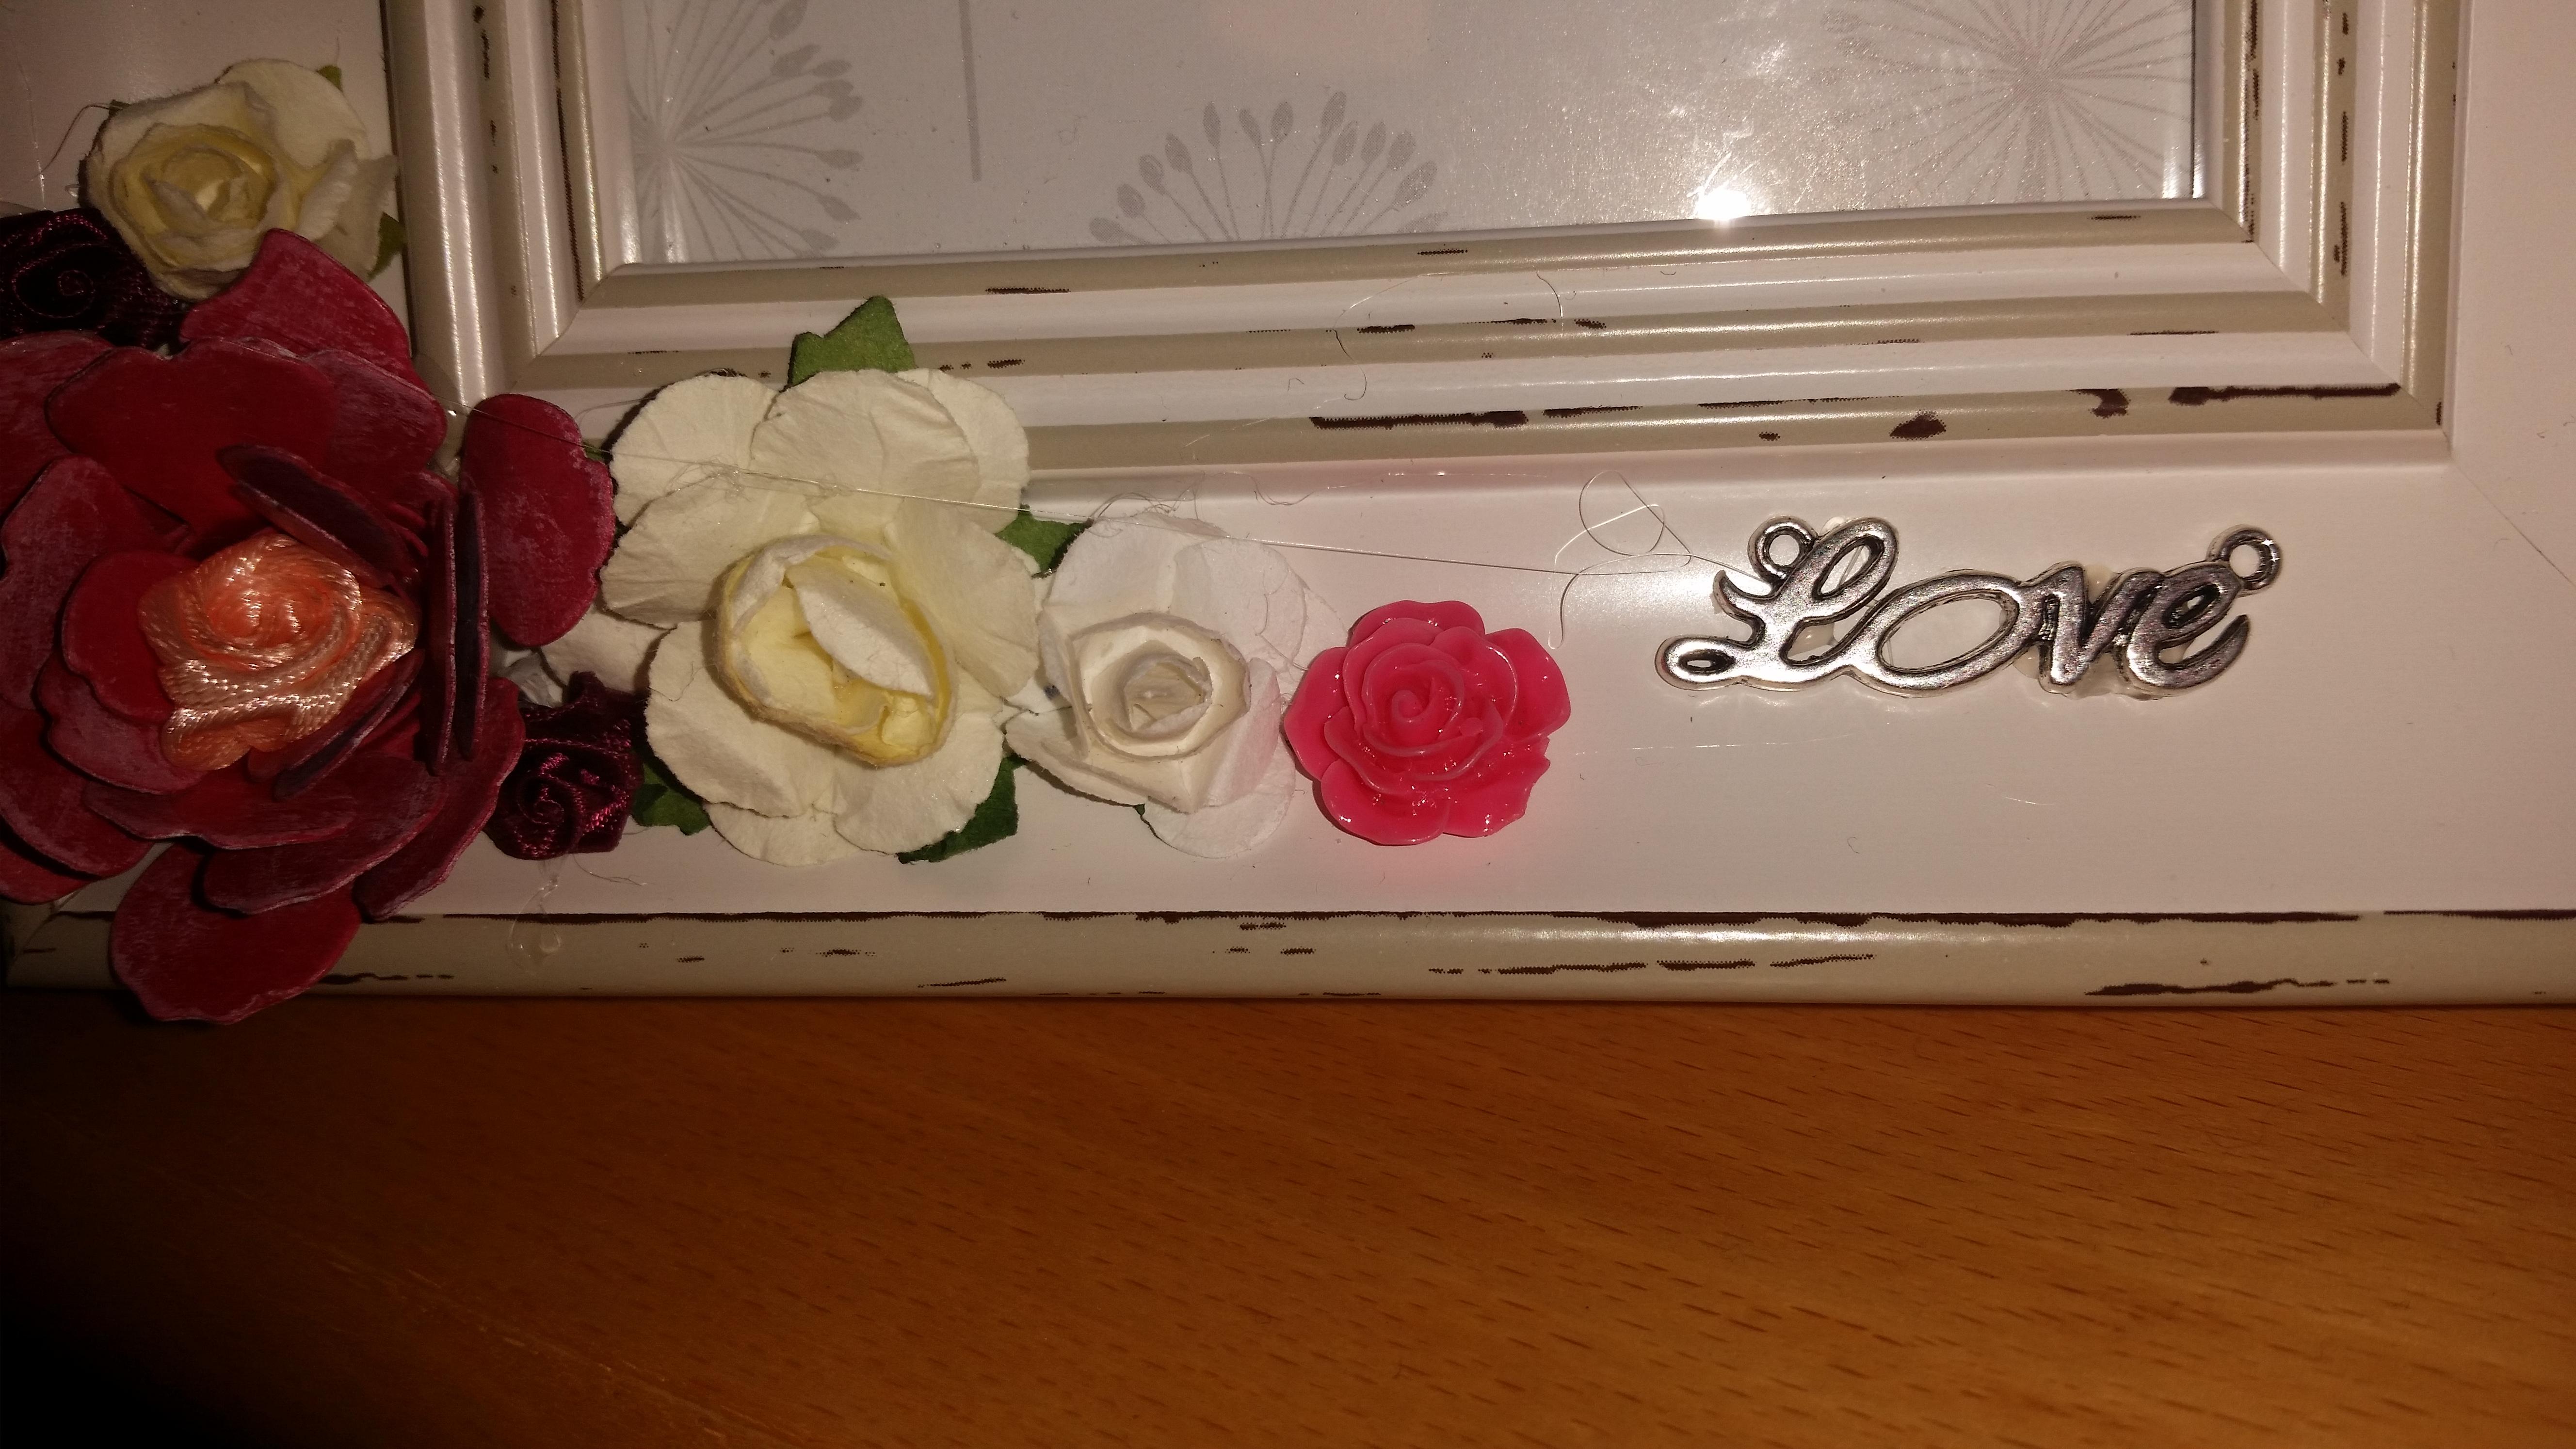 Mrs and Mrs Upcycled Frame #weddinggift #samesexmarriage #MrandMr